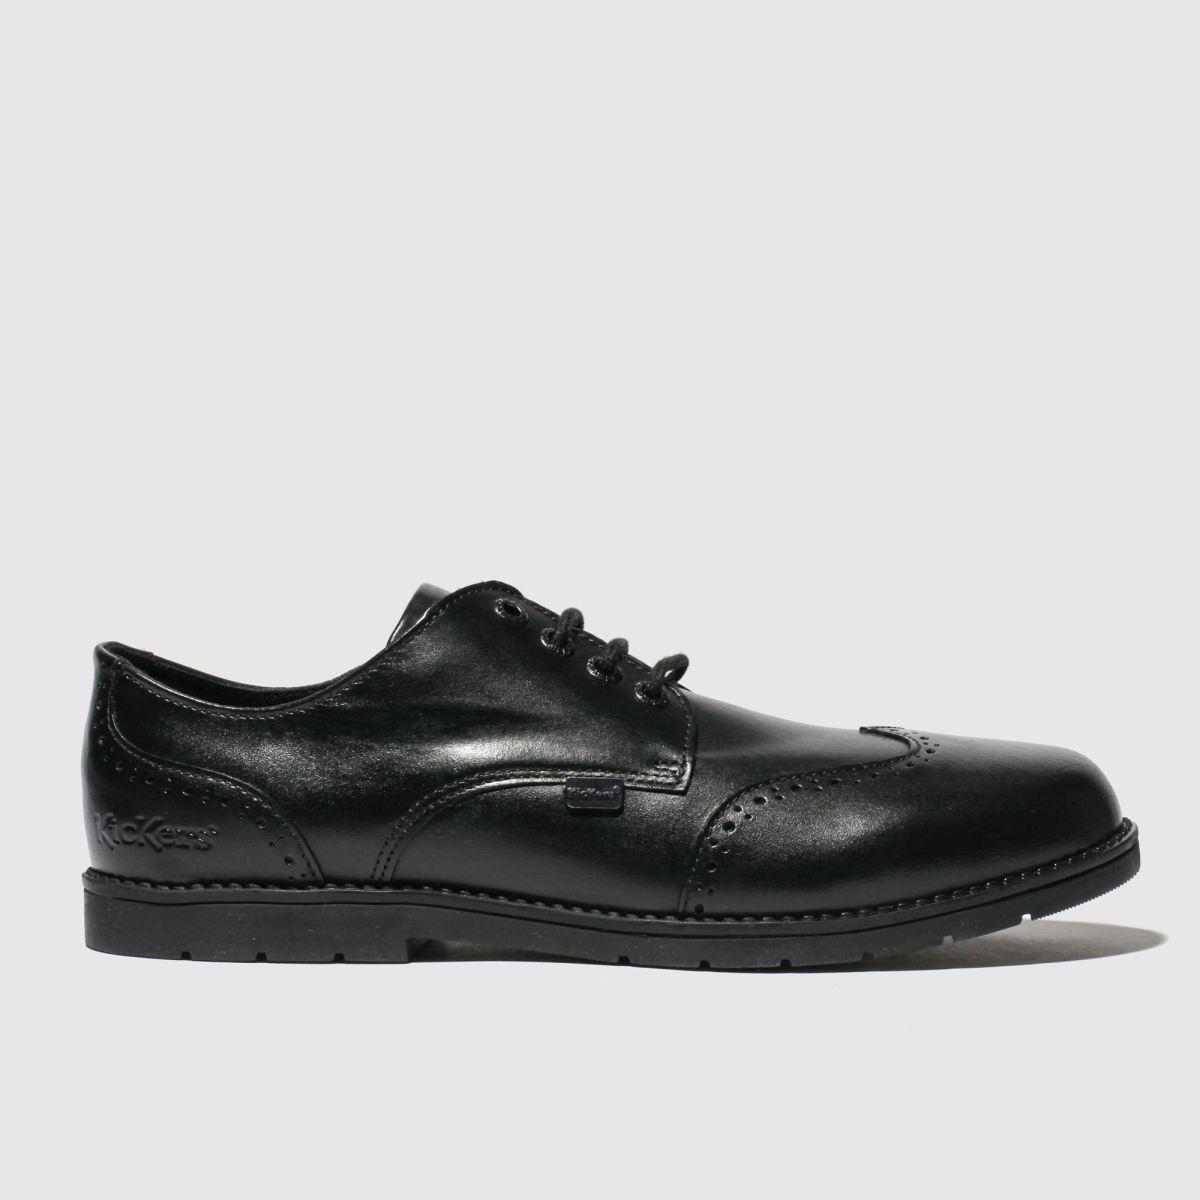 Kickers Black Orin Brogue Lo Shoes Youth